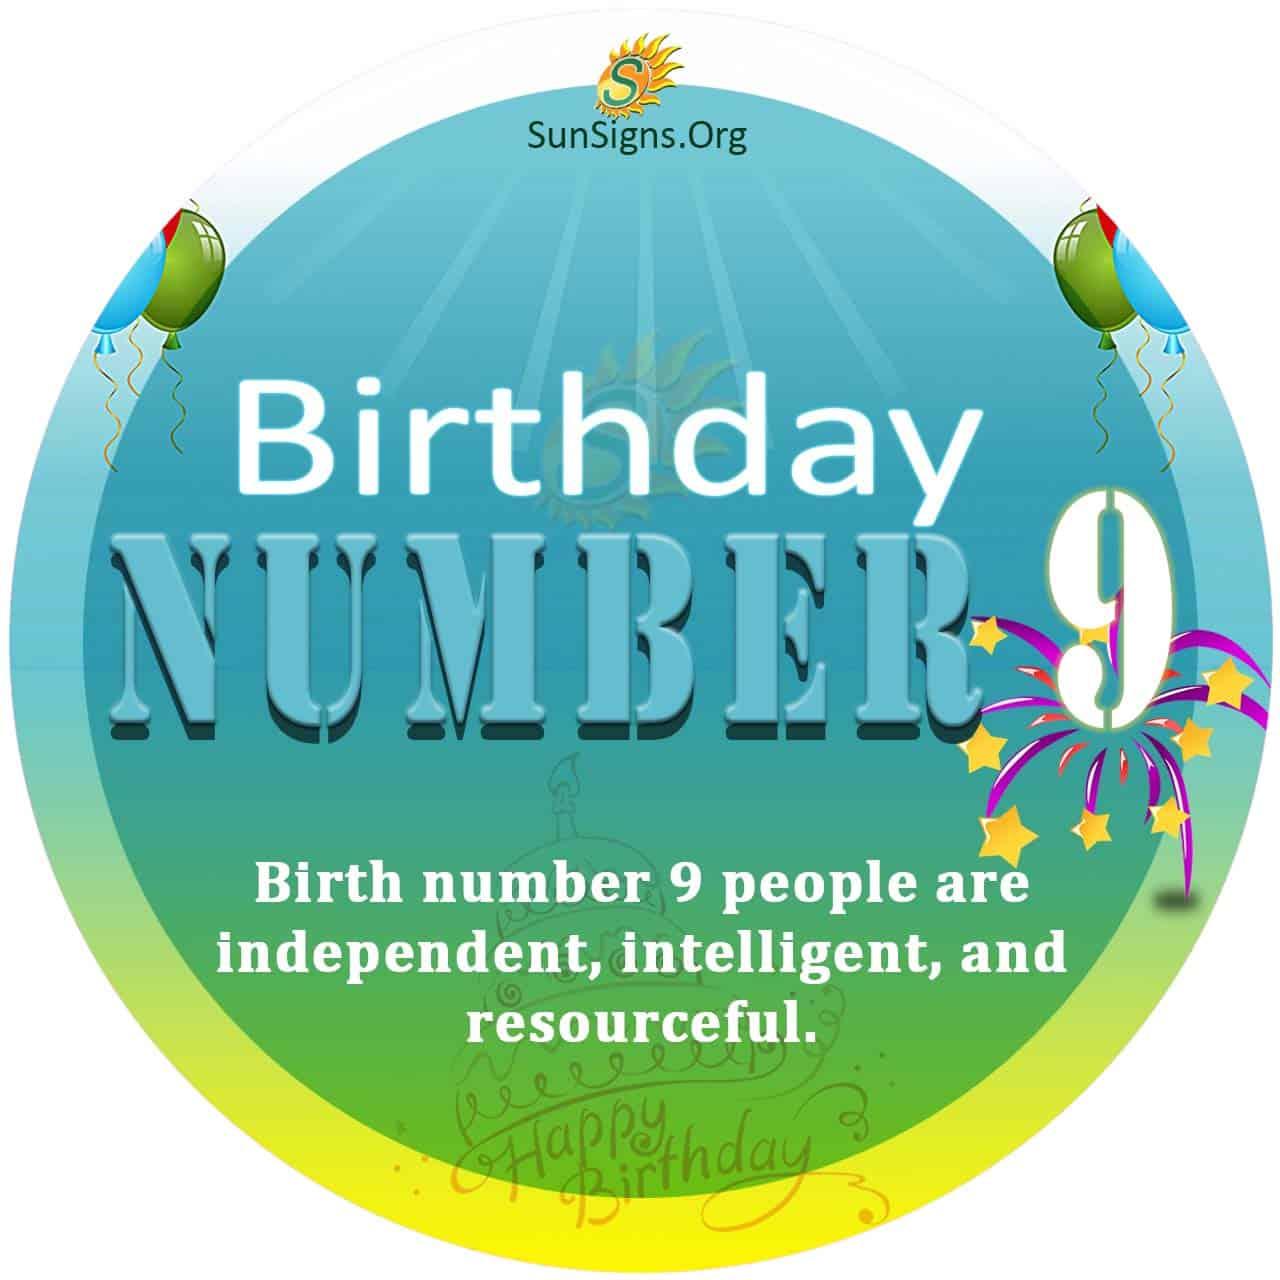 Birthday Number 9